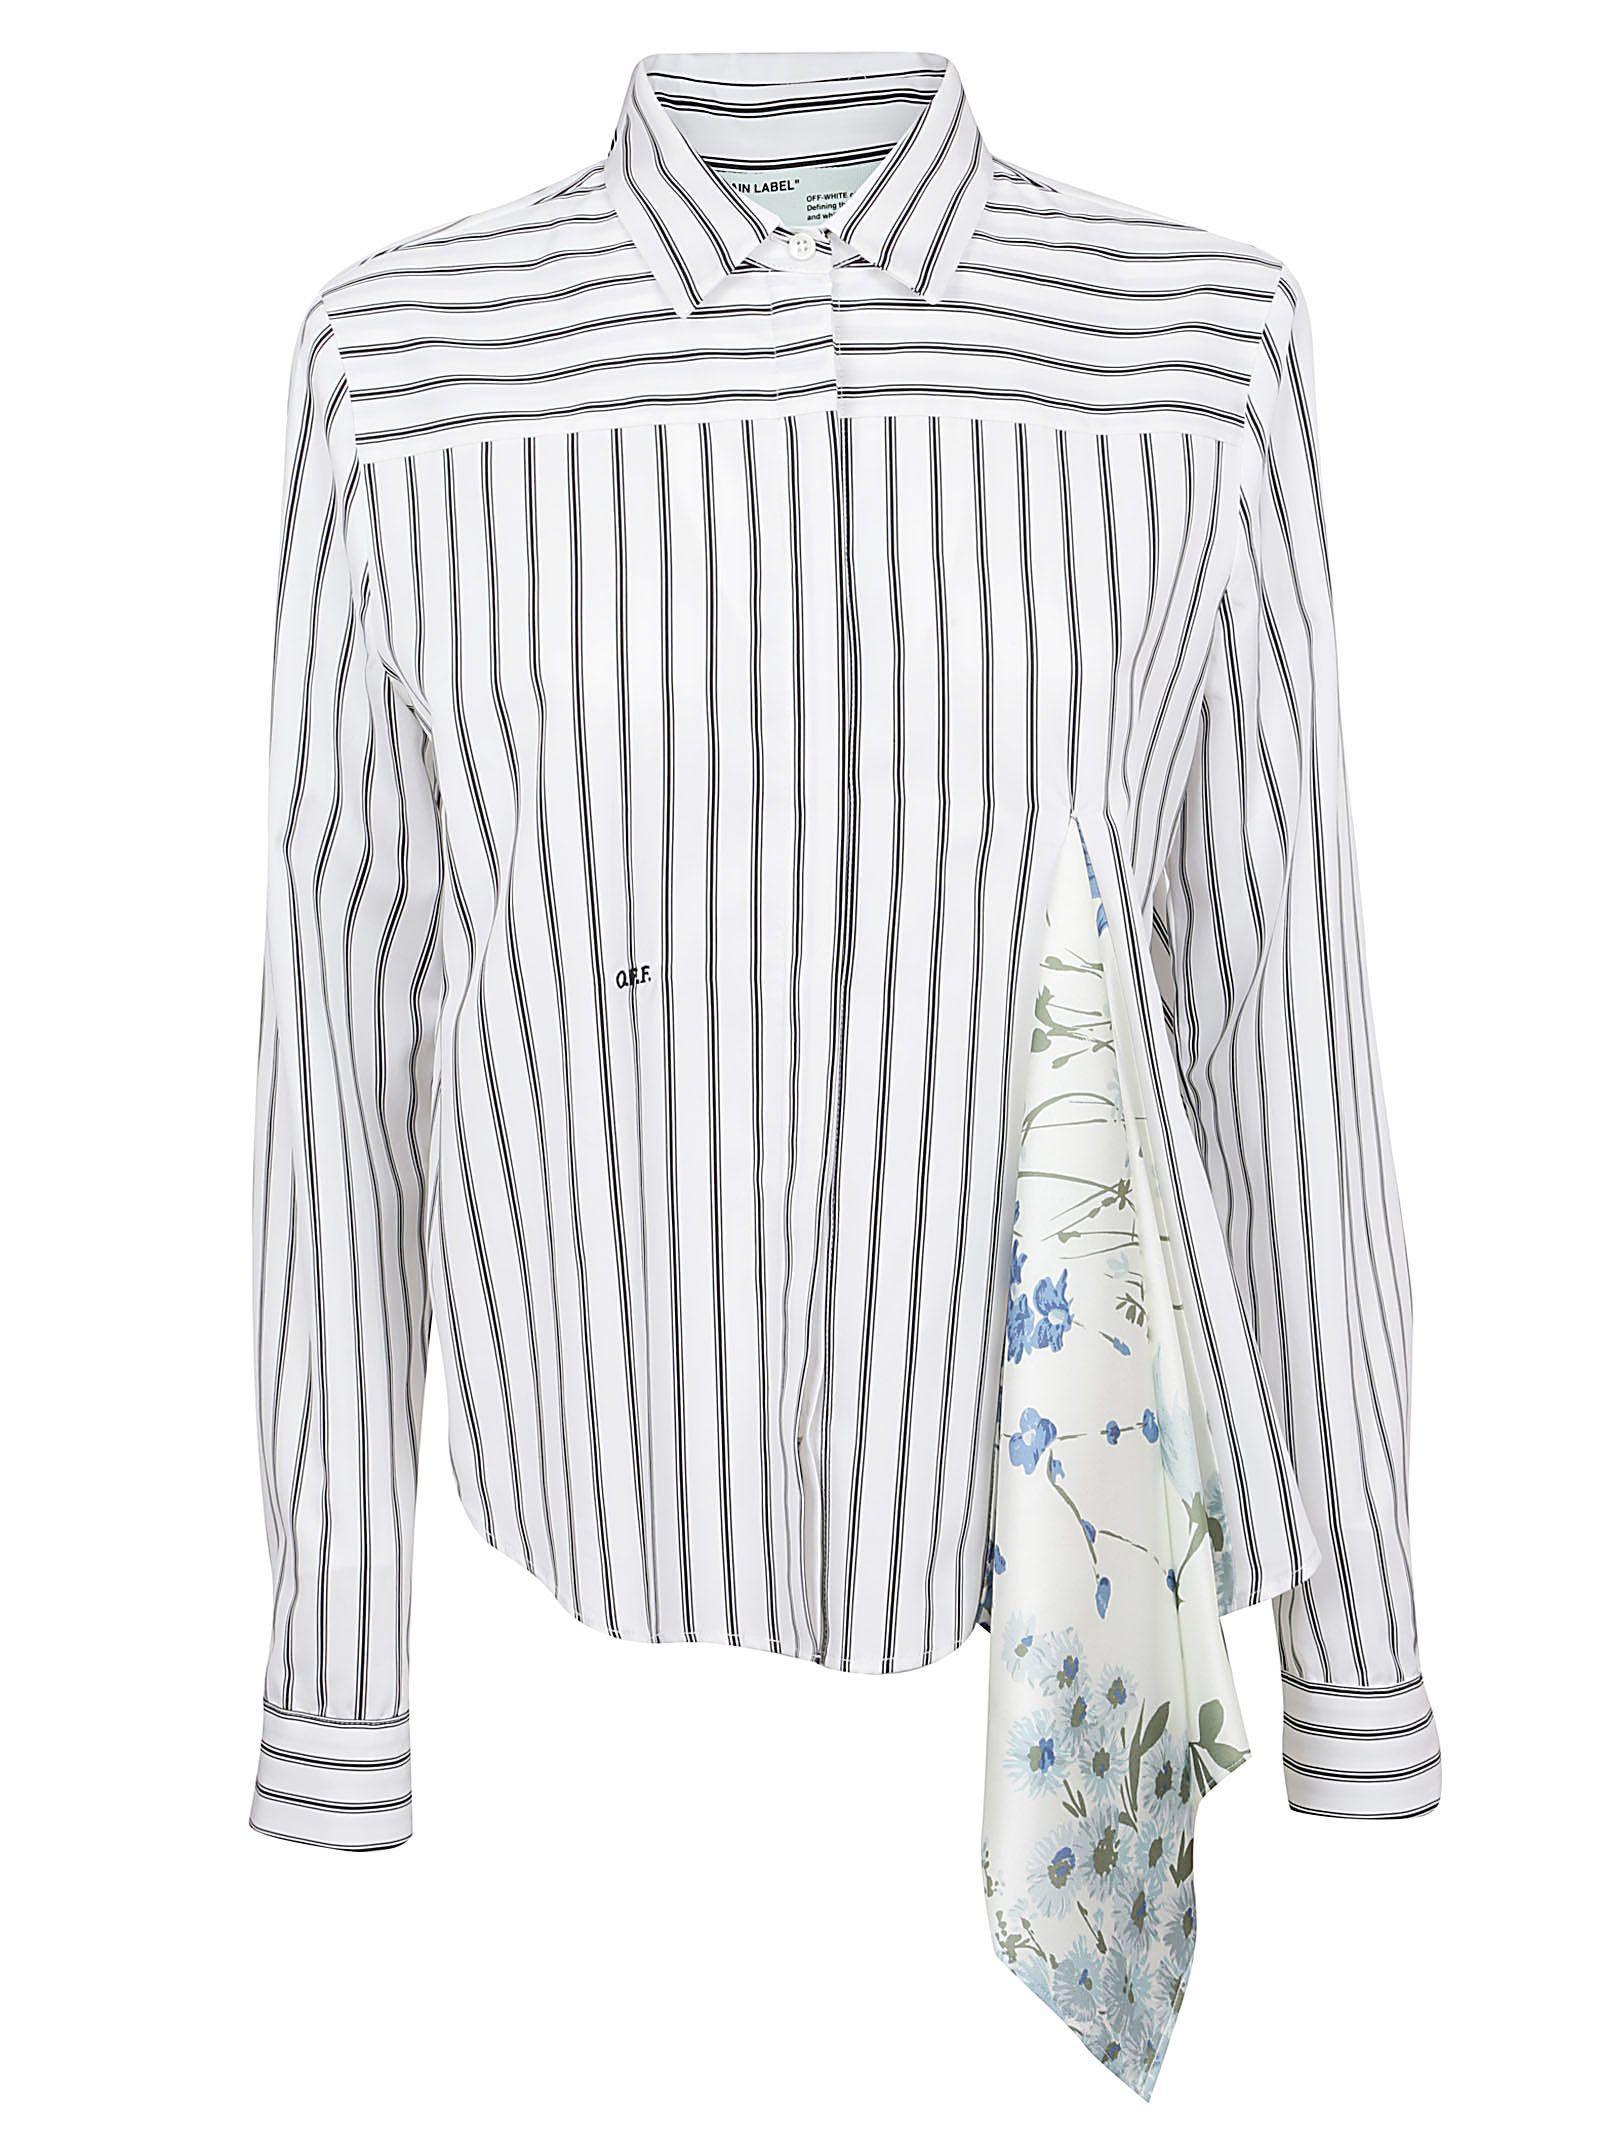 Off-white Scarf Detail Shirt In Stripe